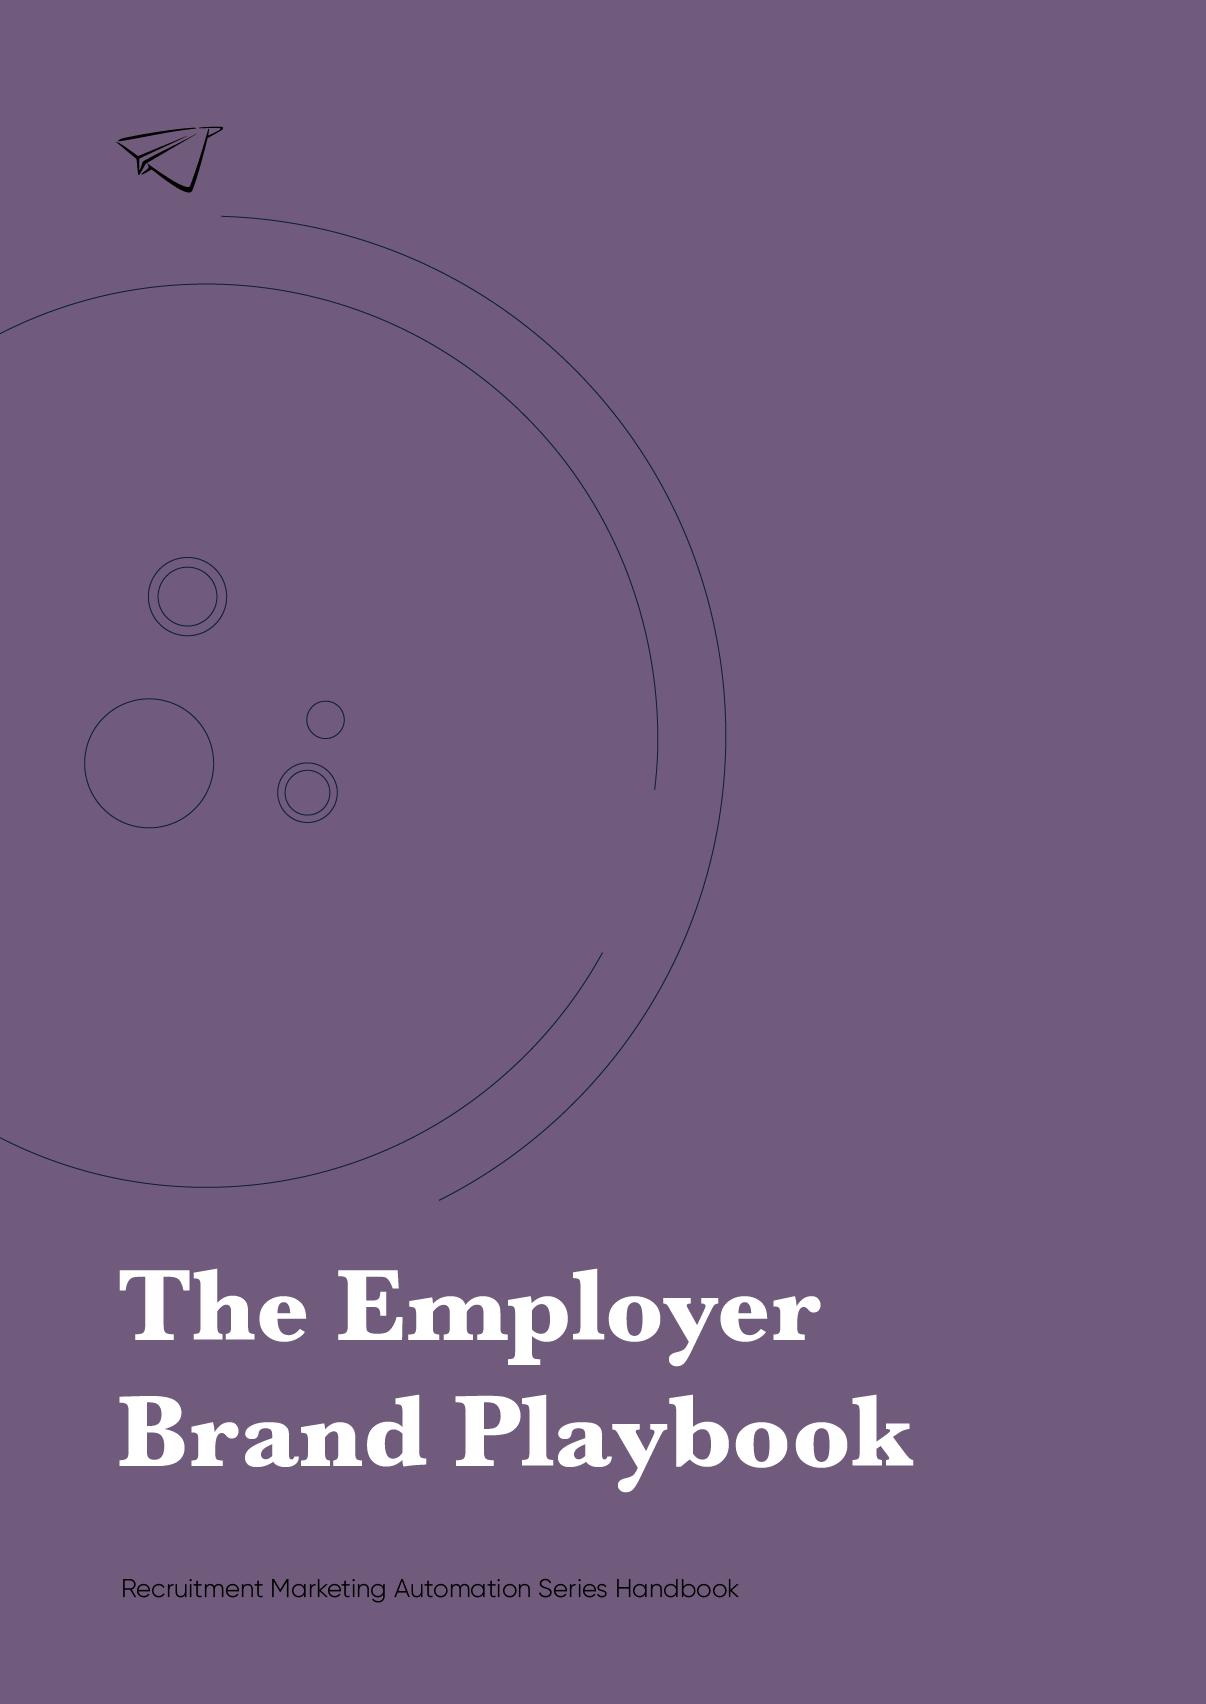 The Employer Brand Playbook